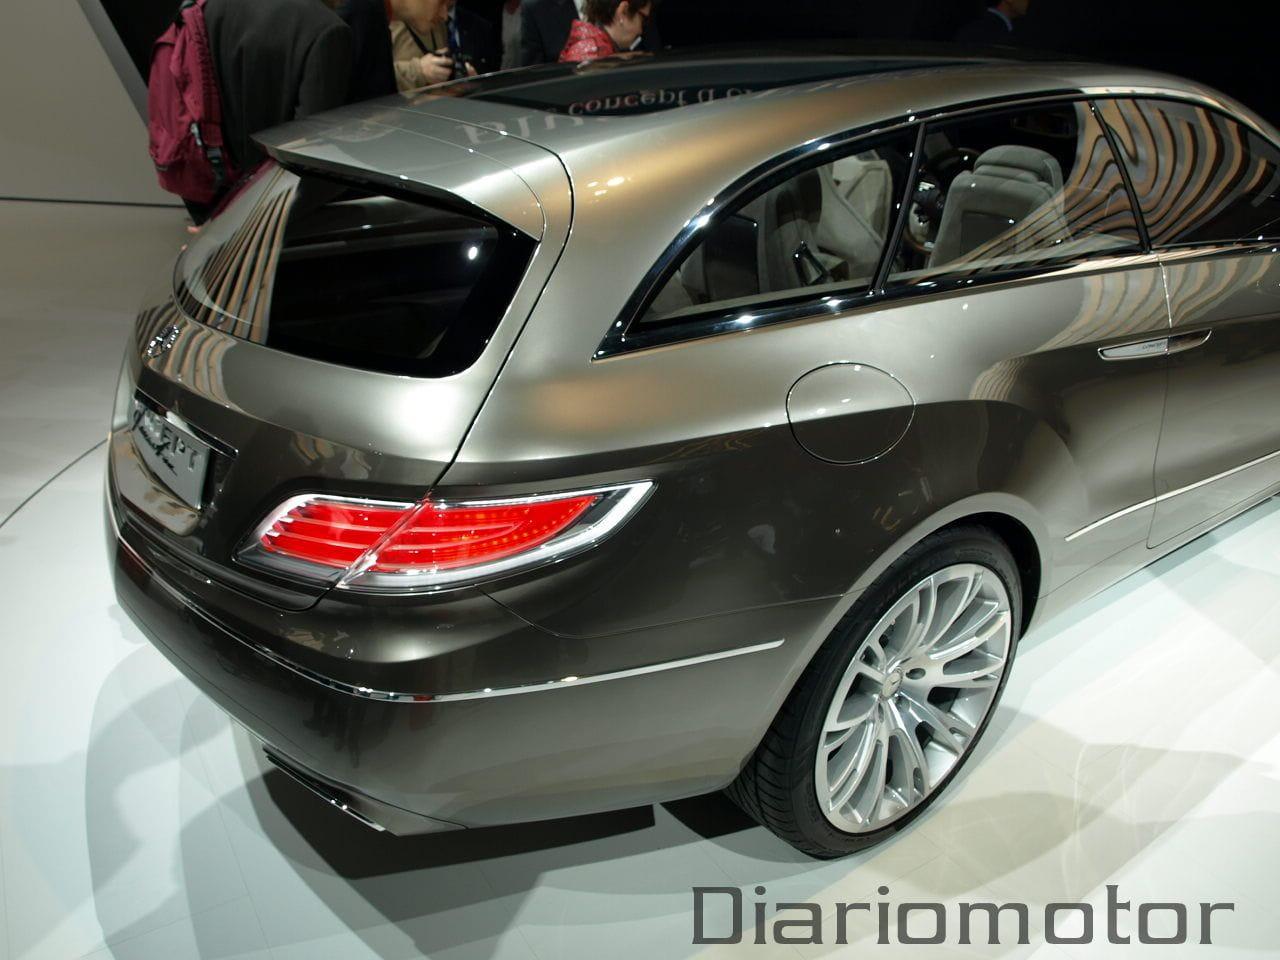 Mercedes conceptfascination en par s 2008 diariomotor for Garage mercedes paris 11